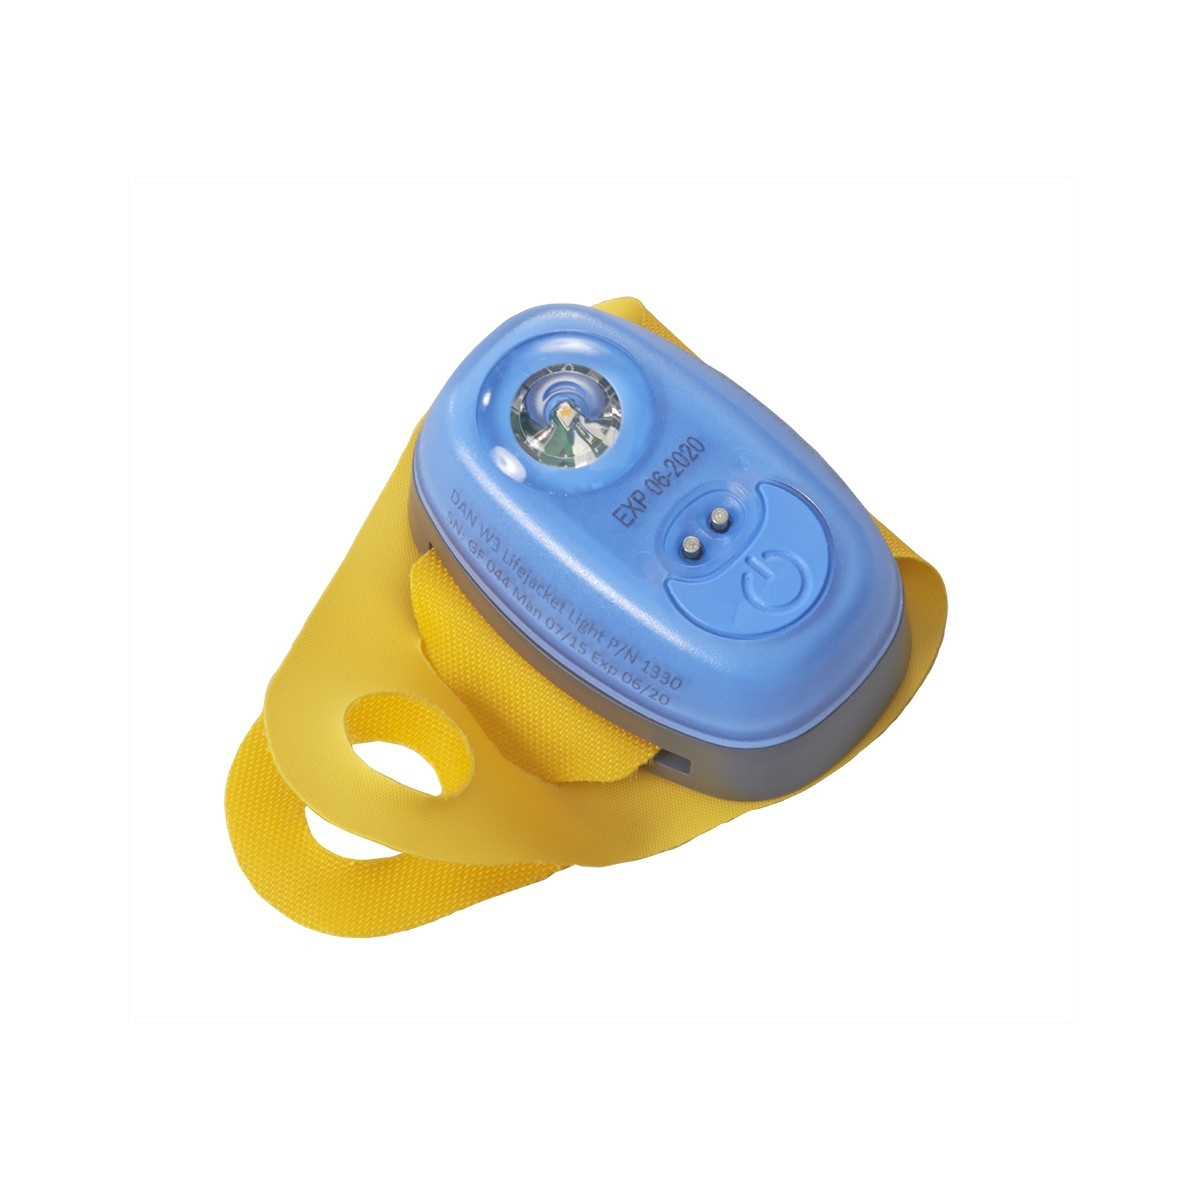 W3 compact flashing light